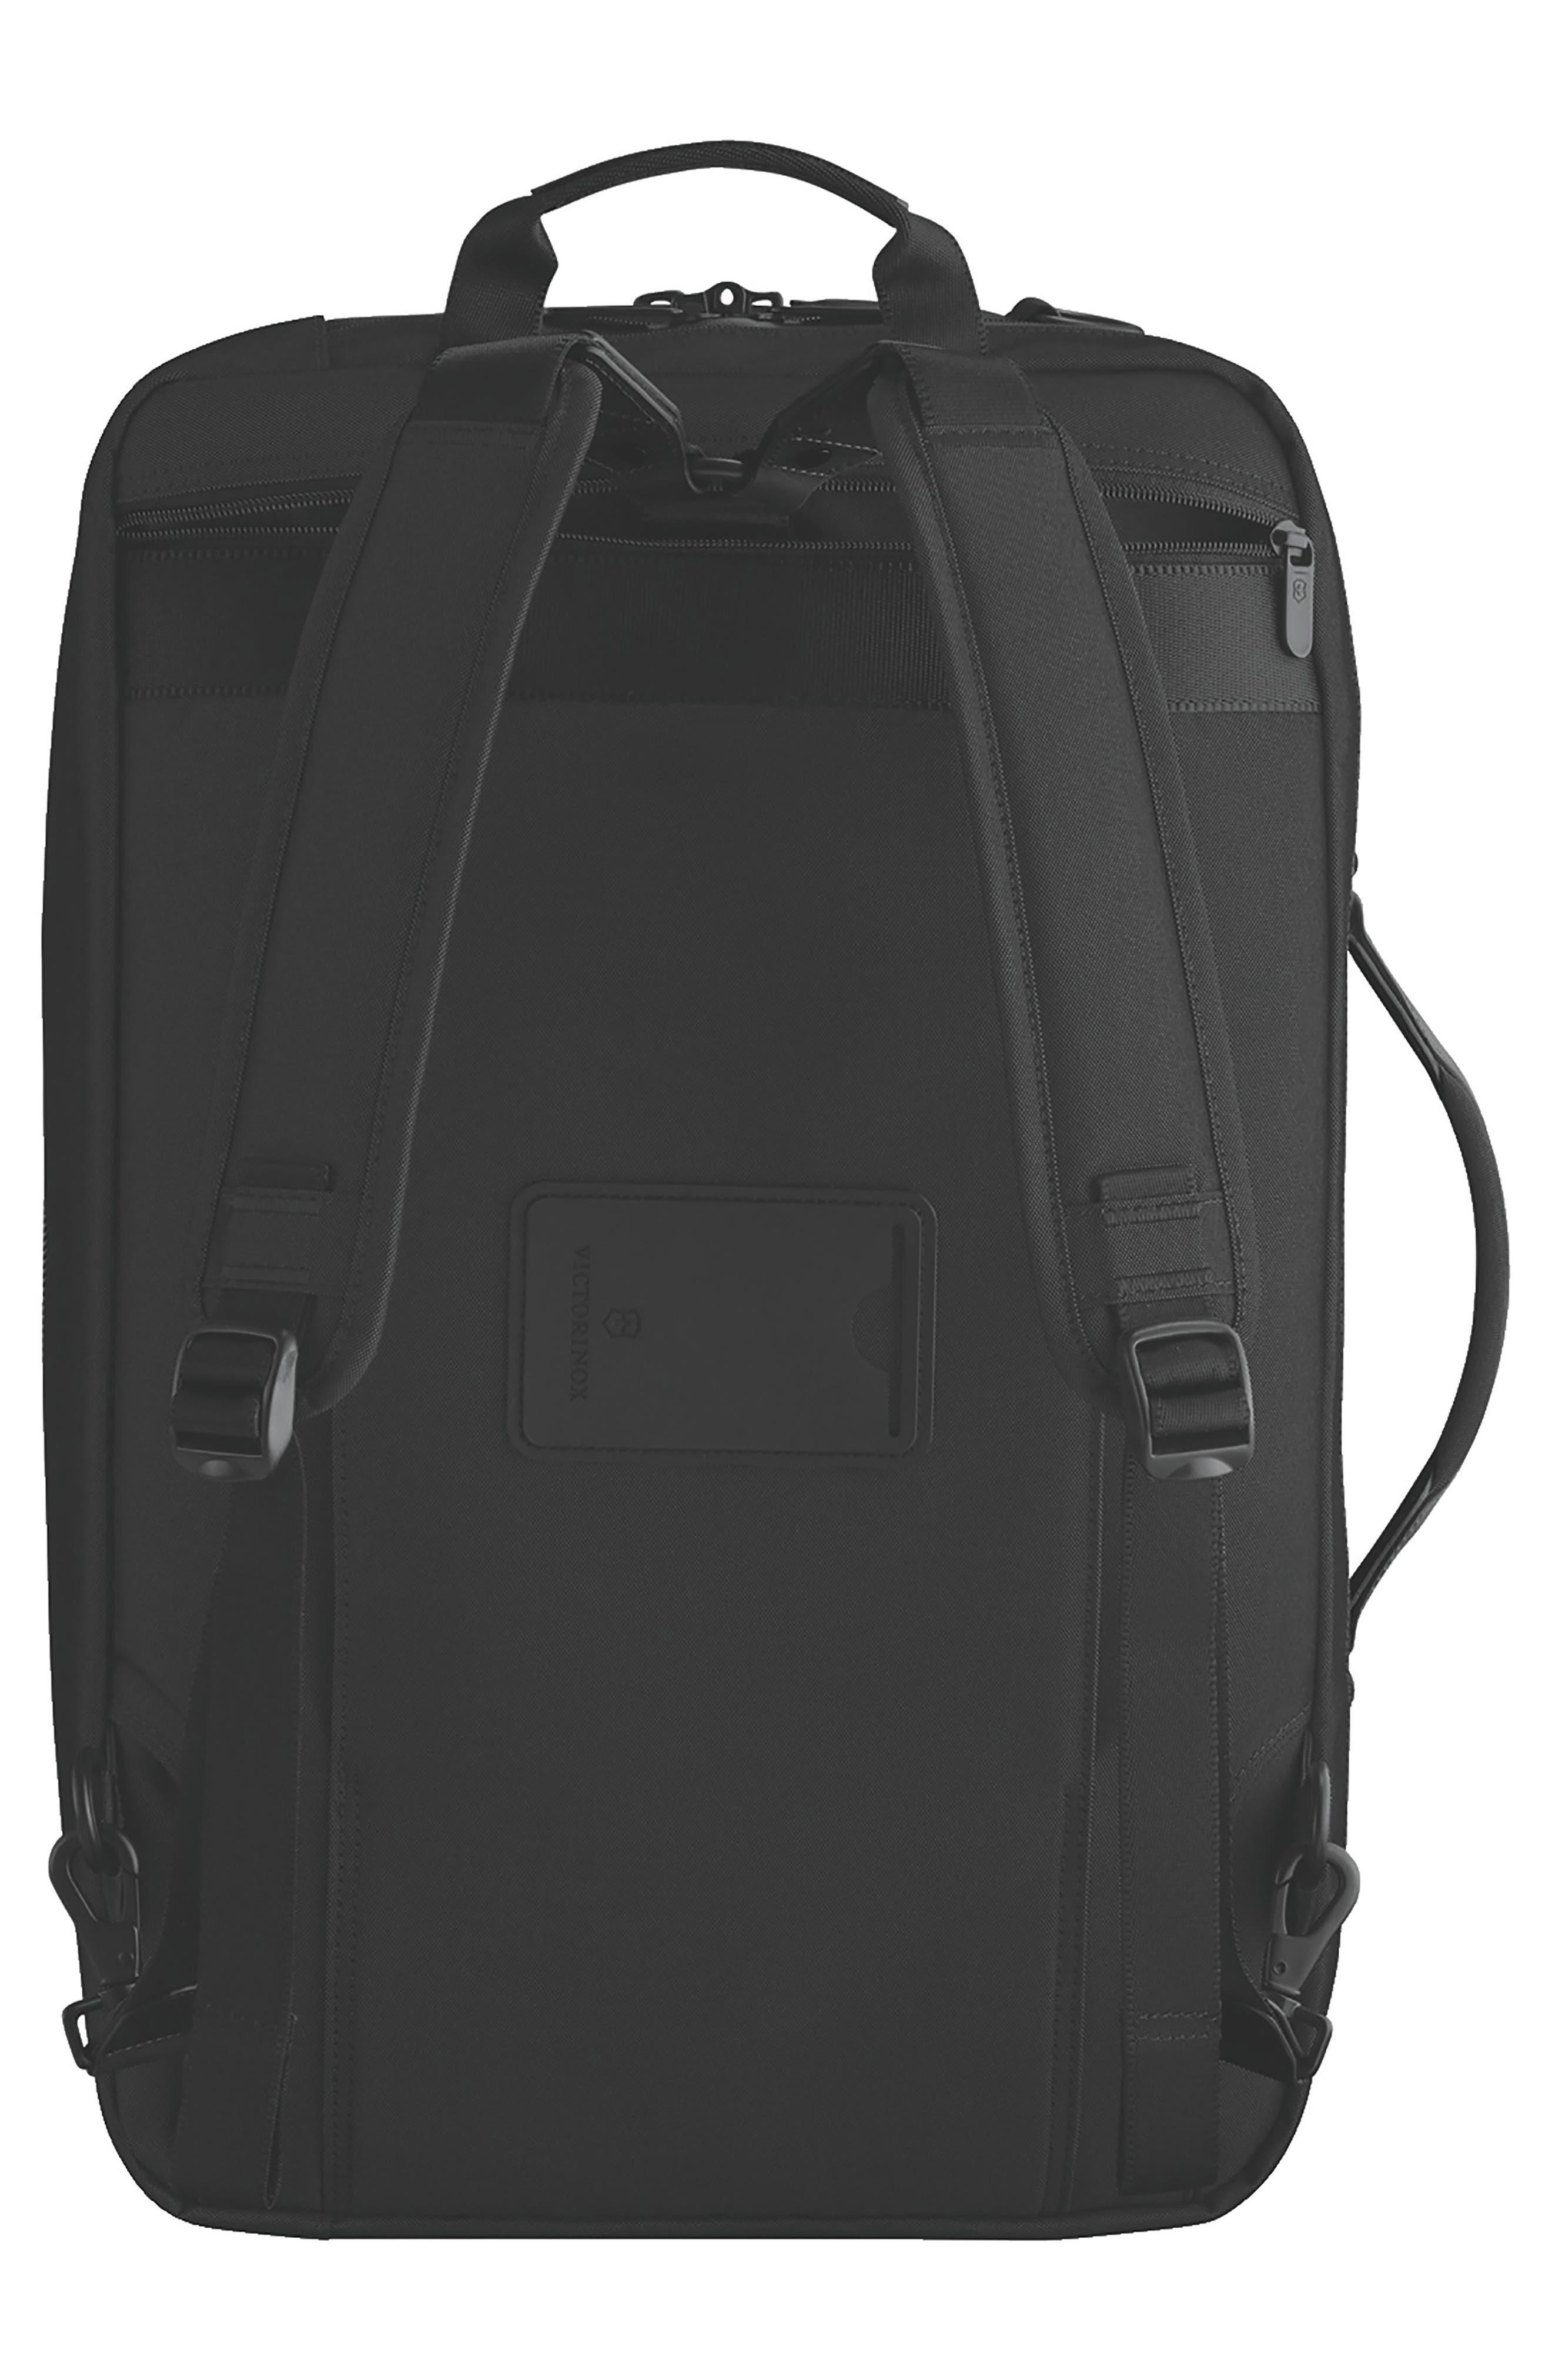 Lexicon 2.0 Convertible Backpack,                             Alternate thumbnail 2, color,                             001